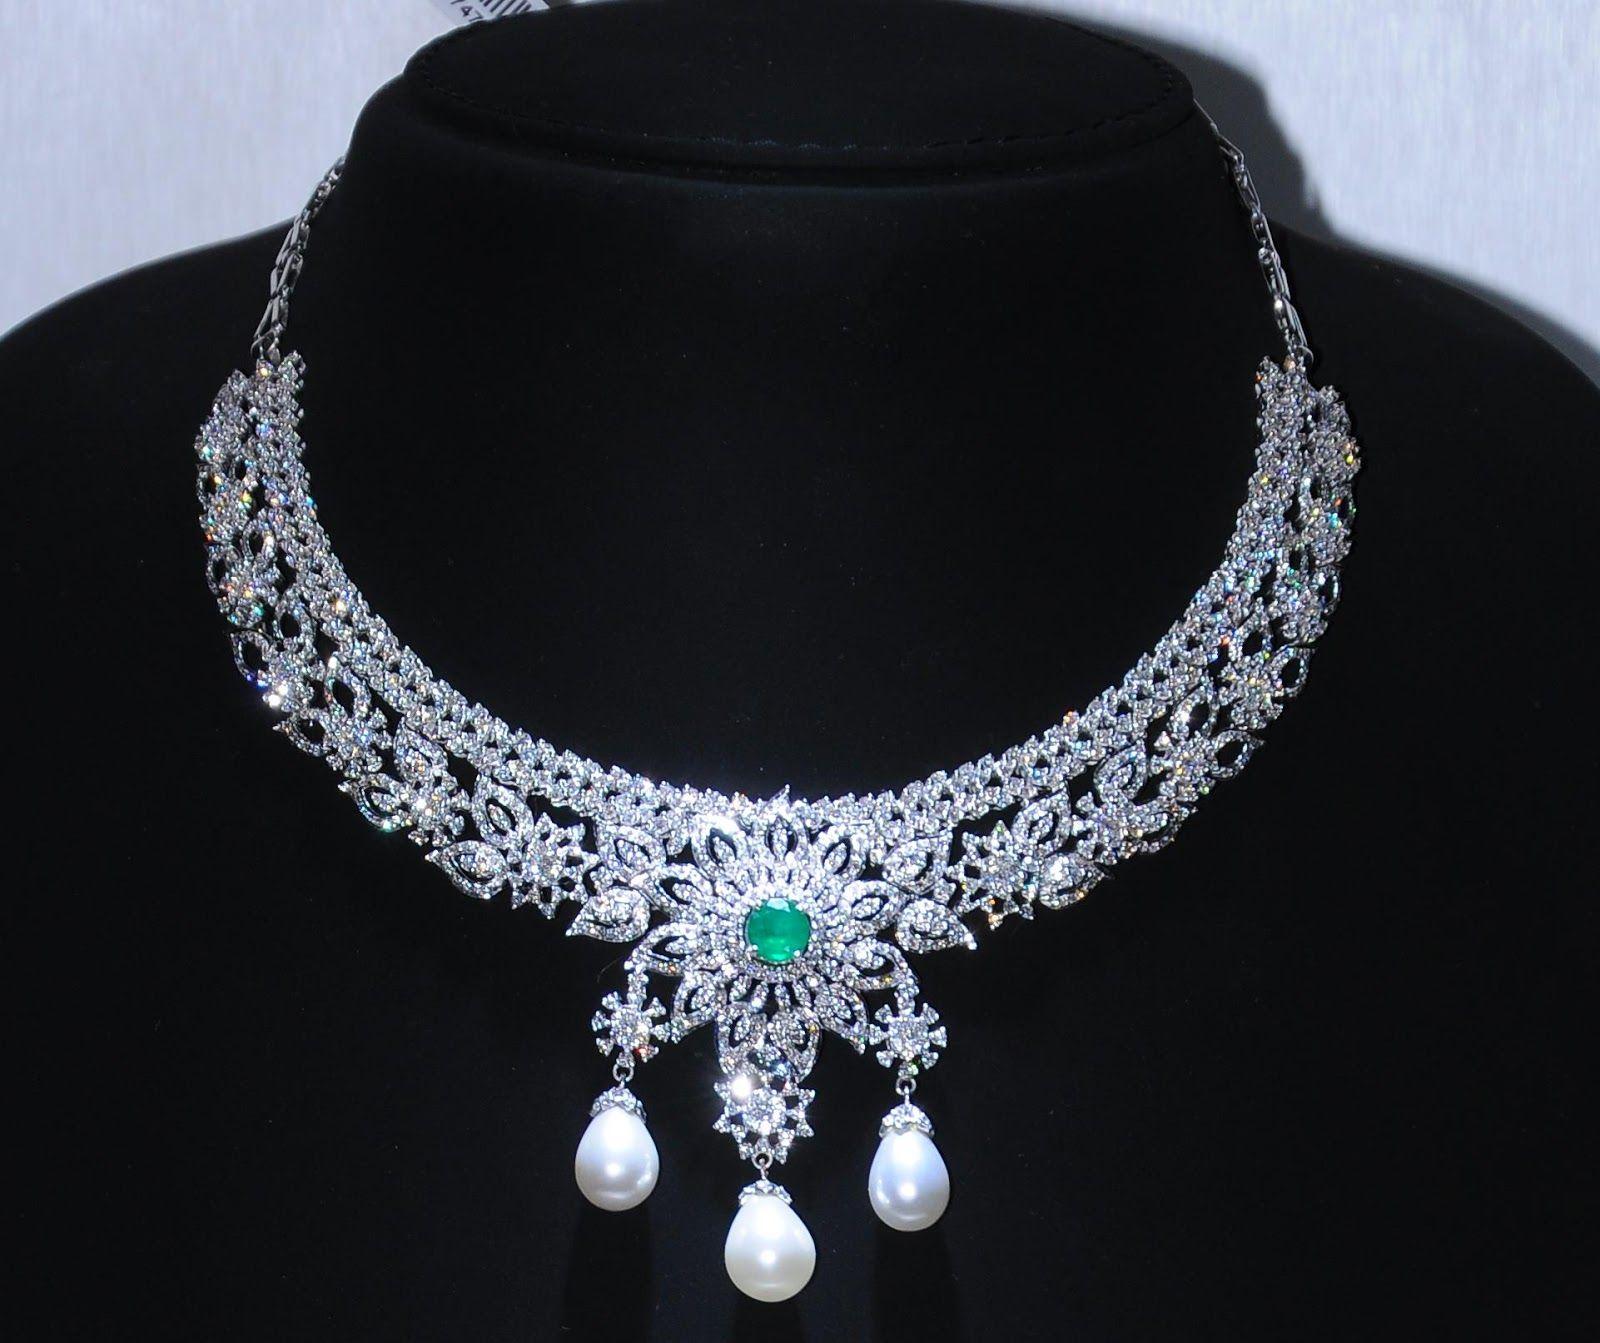 diamond-necklaces-for-girls-111.jpg 1,600×1,343 pixels | Jewelry ...